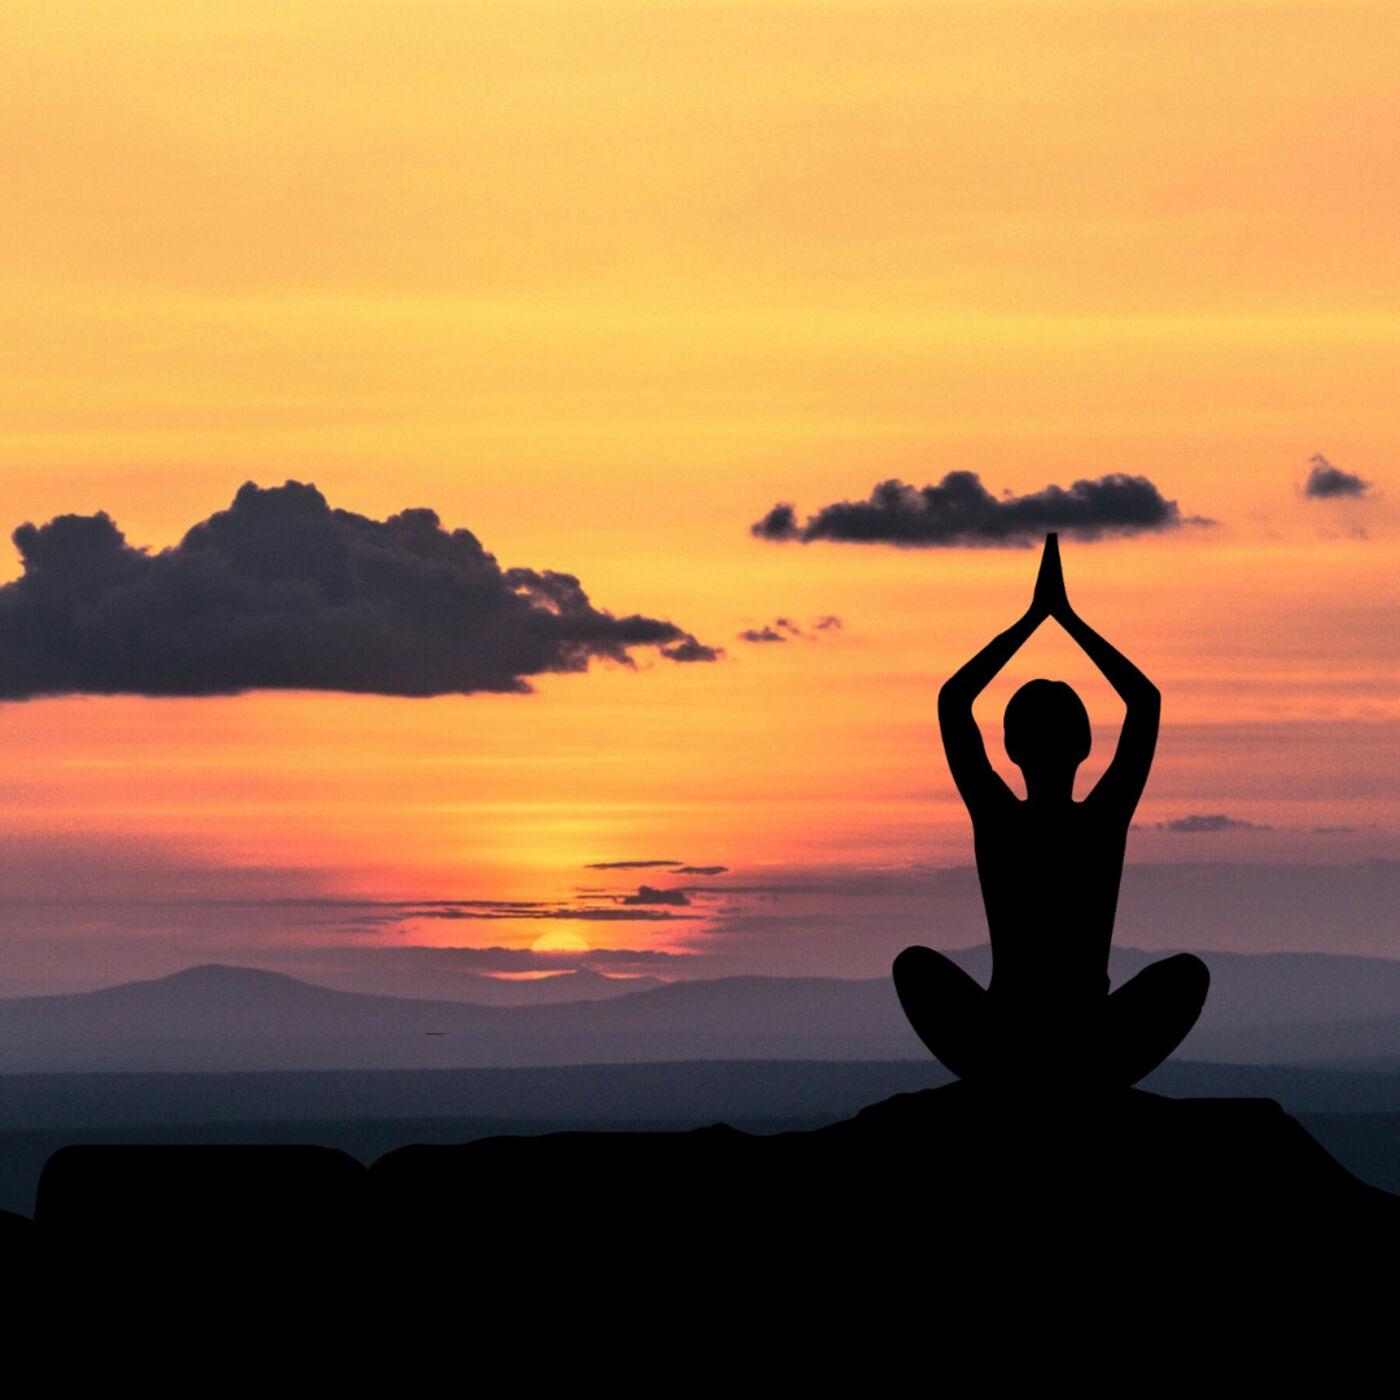 23. Yoga: Service and Spirituality feat. Reema Datta